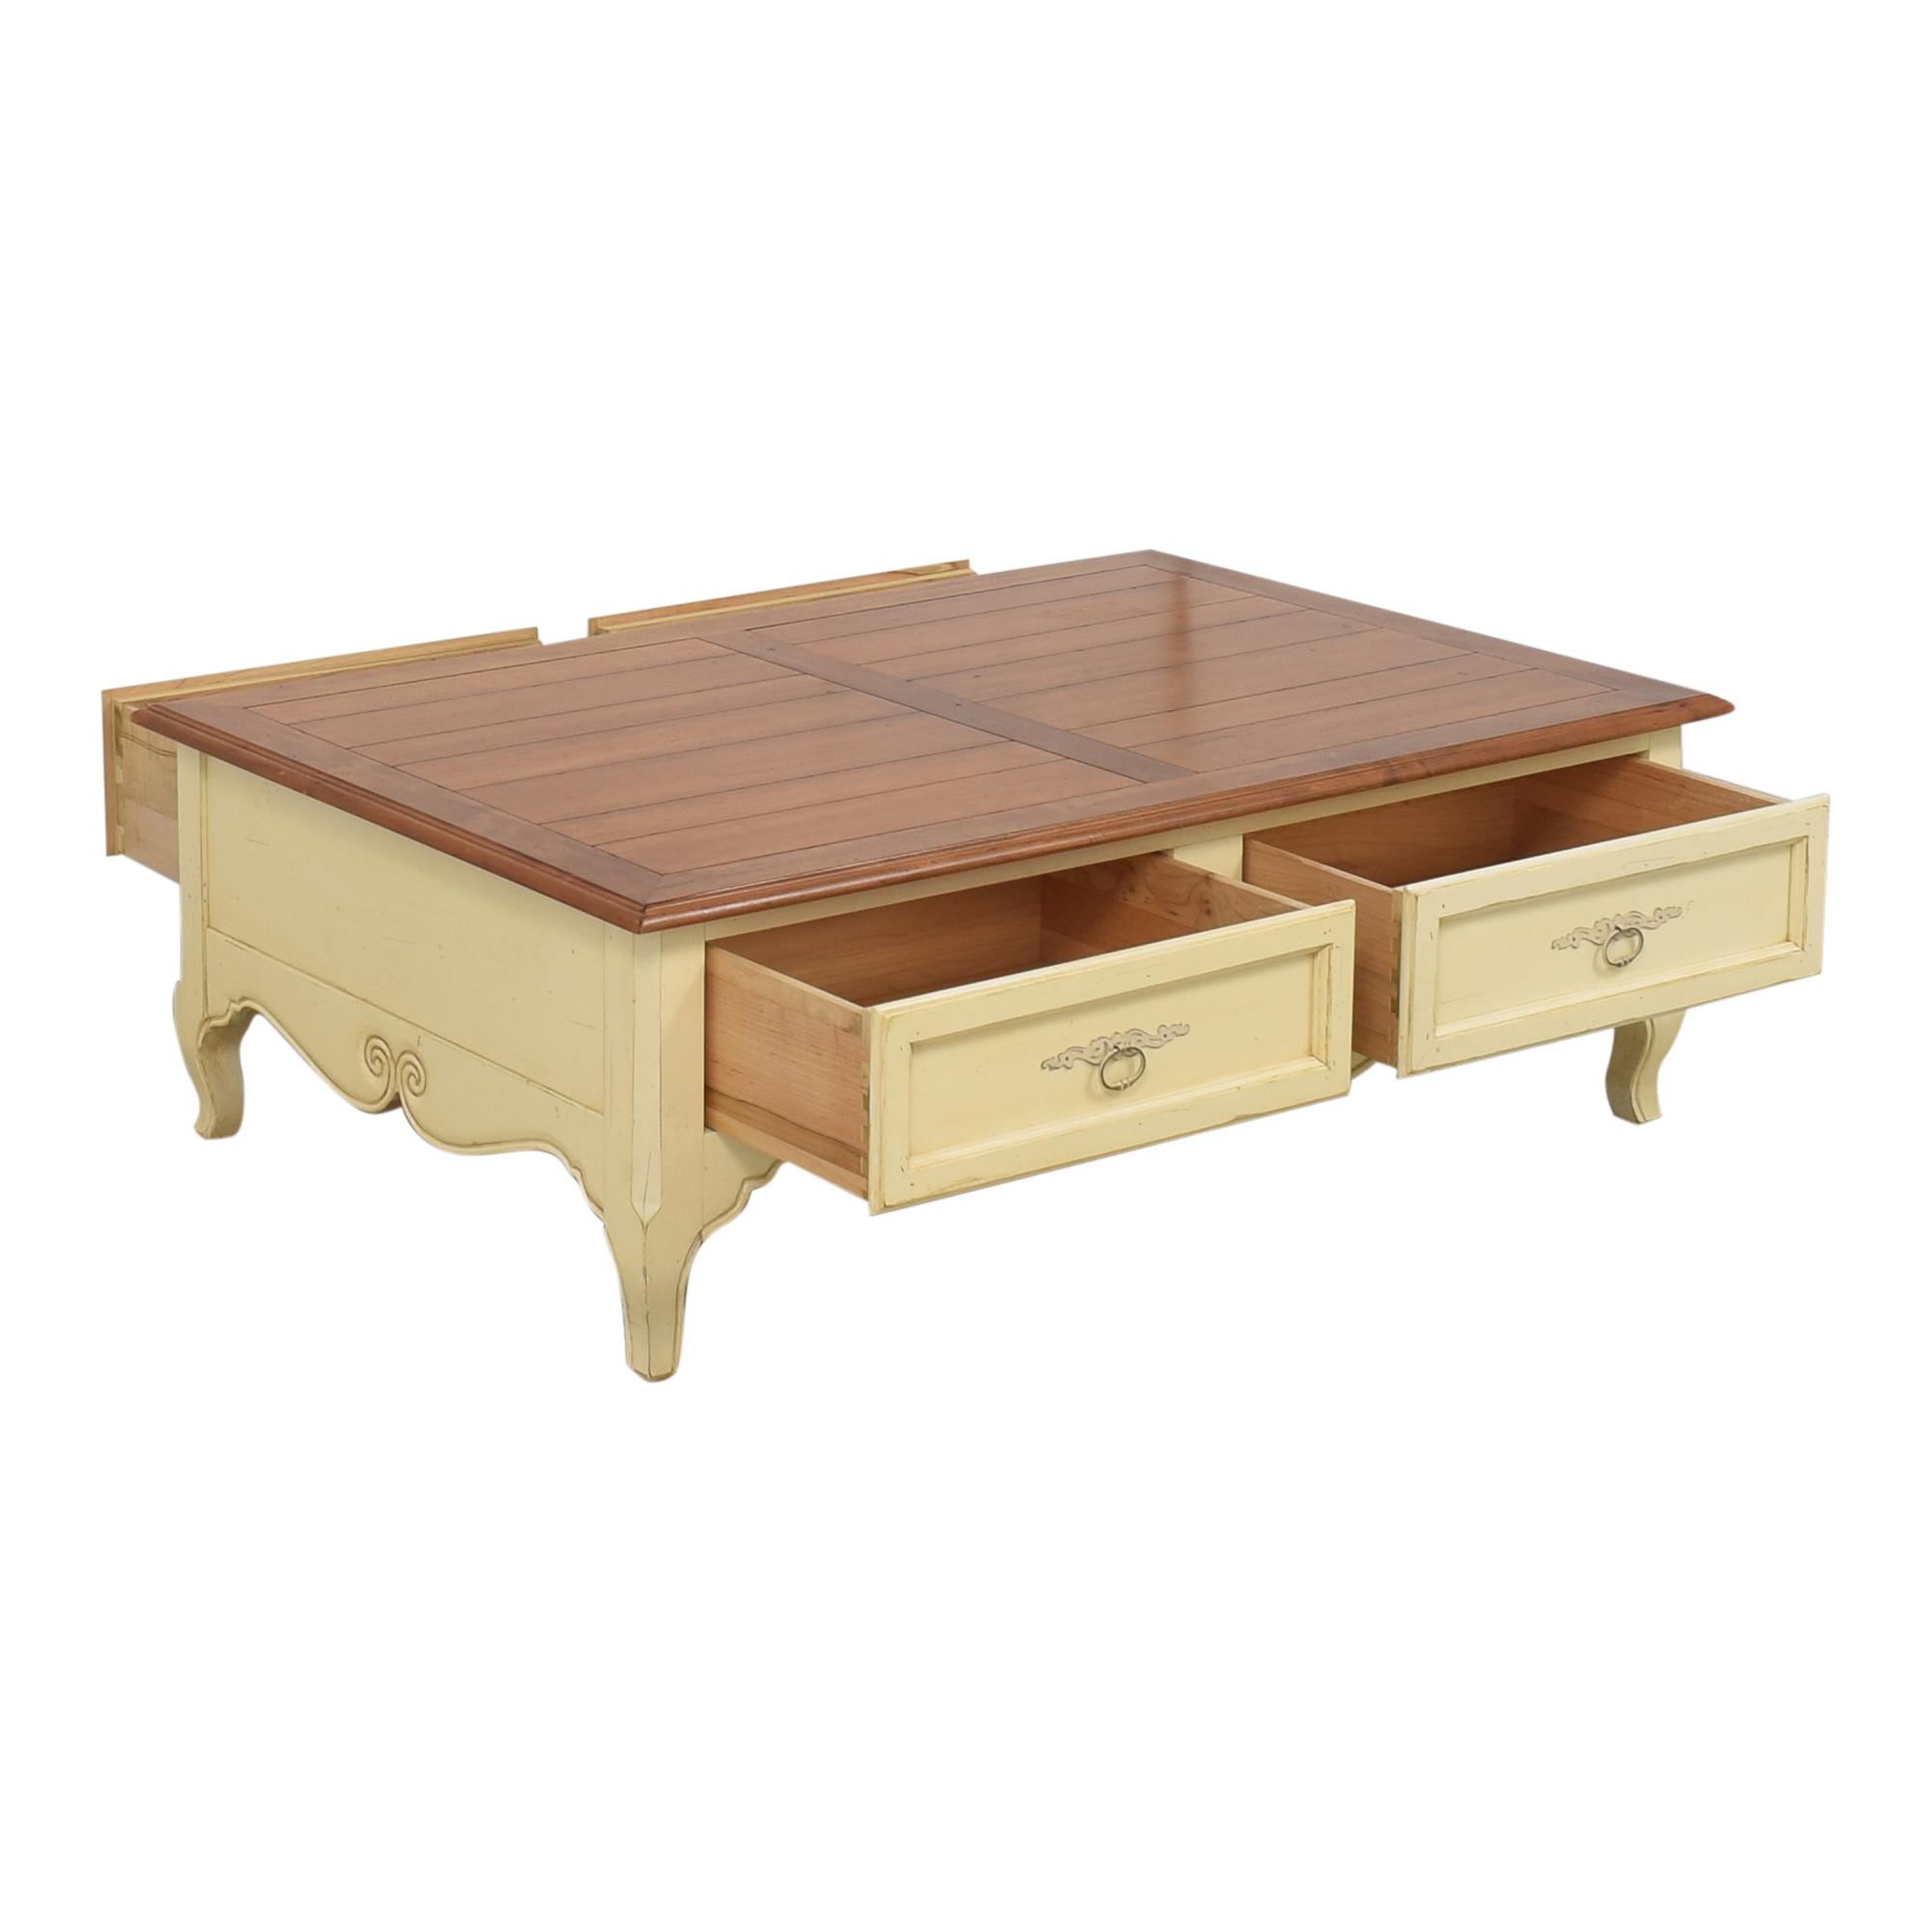 Ethan Allen Lasalle Coffee Table sale